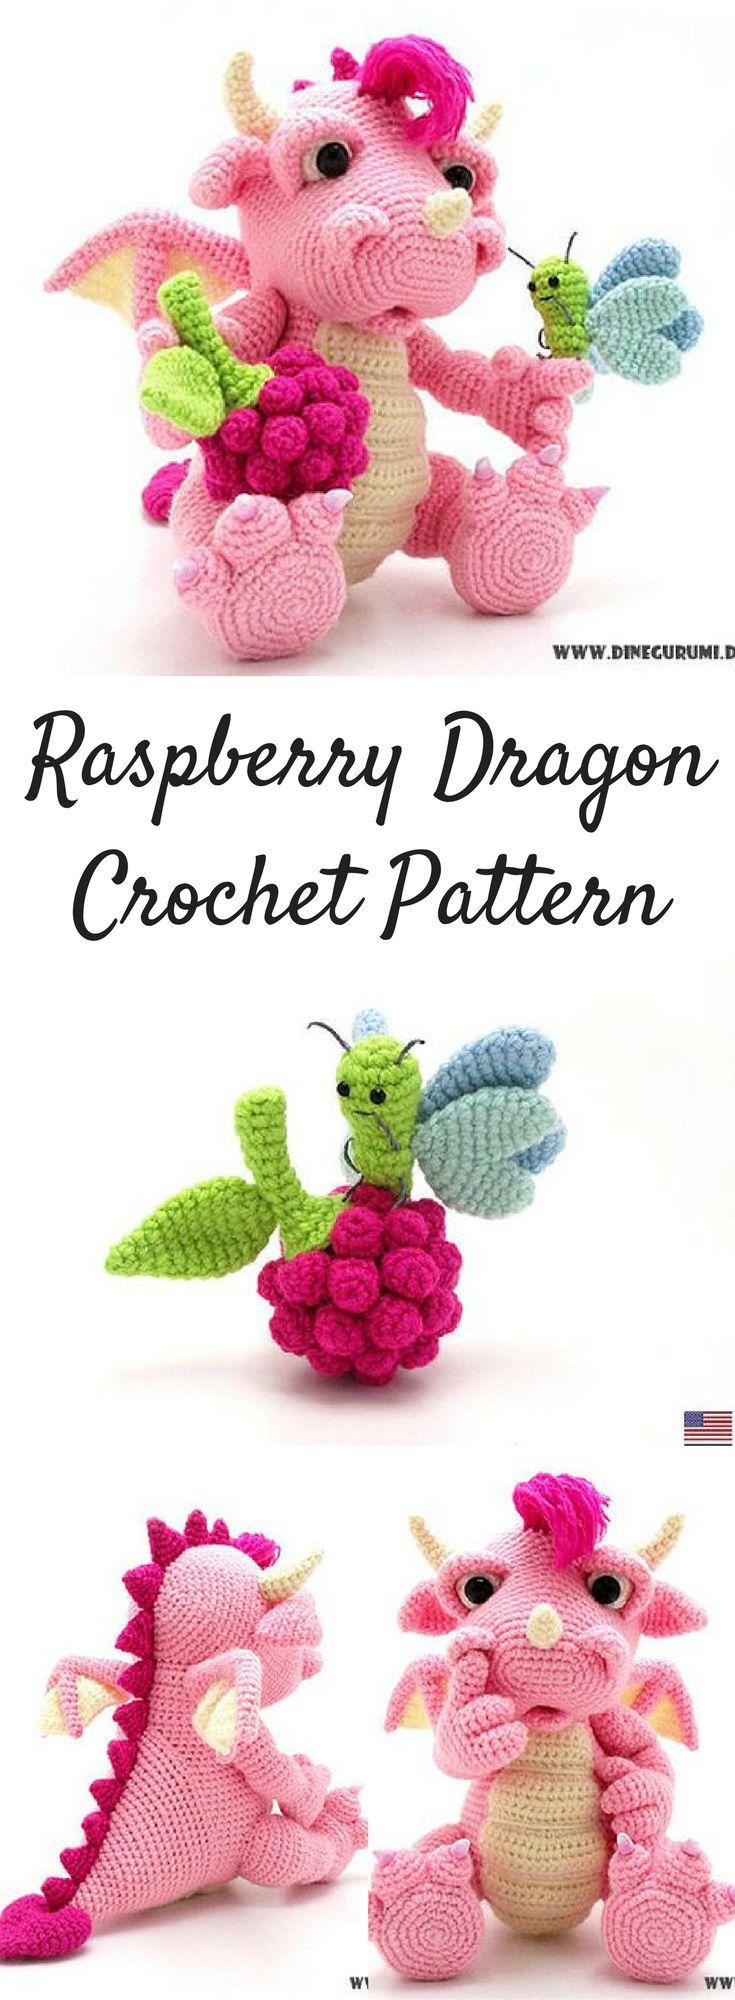 Raspberry dragon crochet pattern amigurumi | Ganchillo, Patrones ...